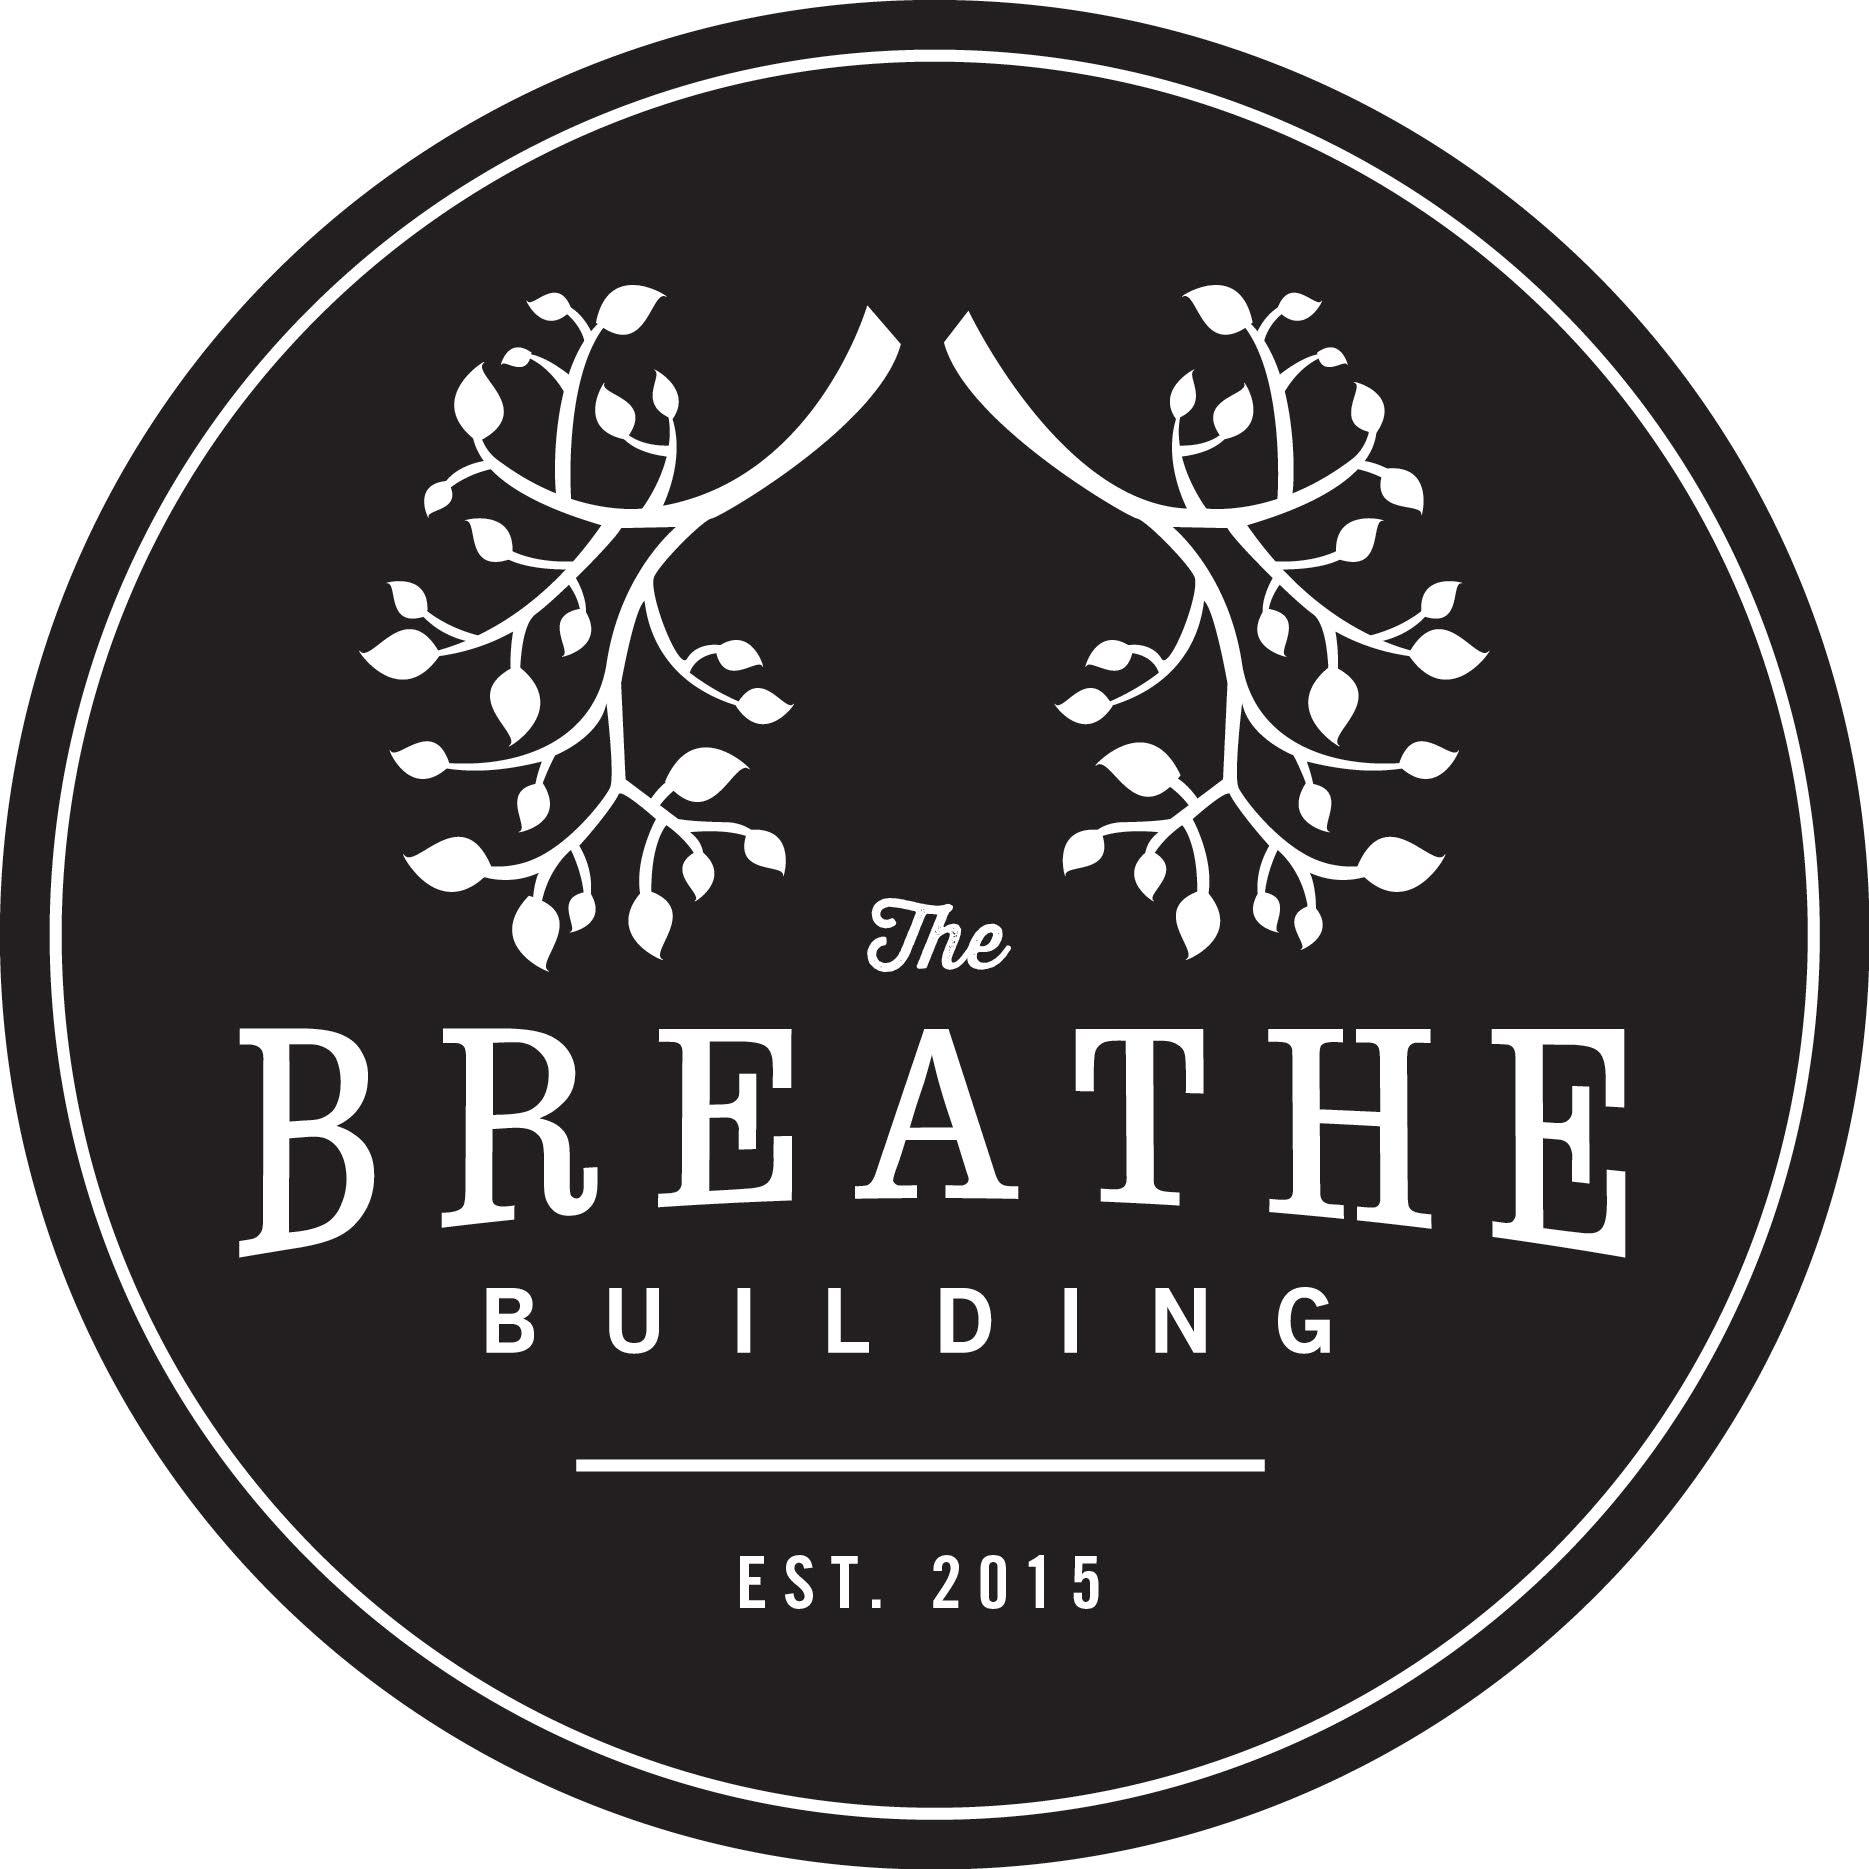 Breathe Building badge.jpeg